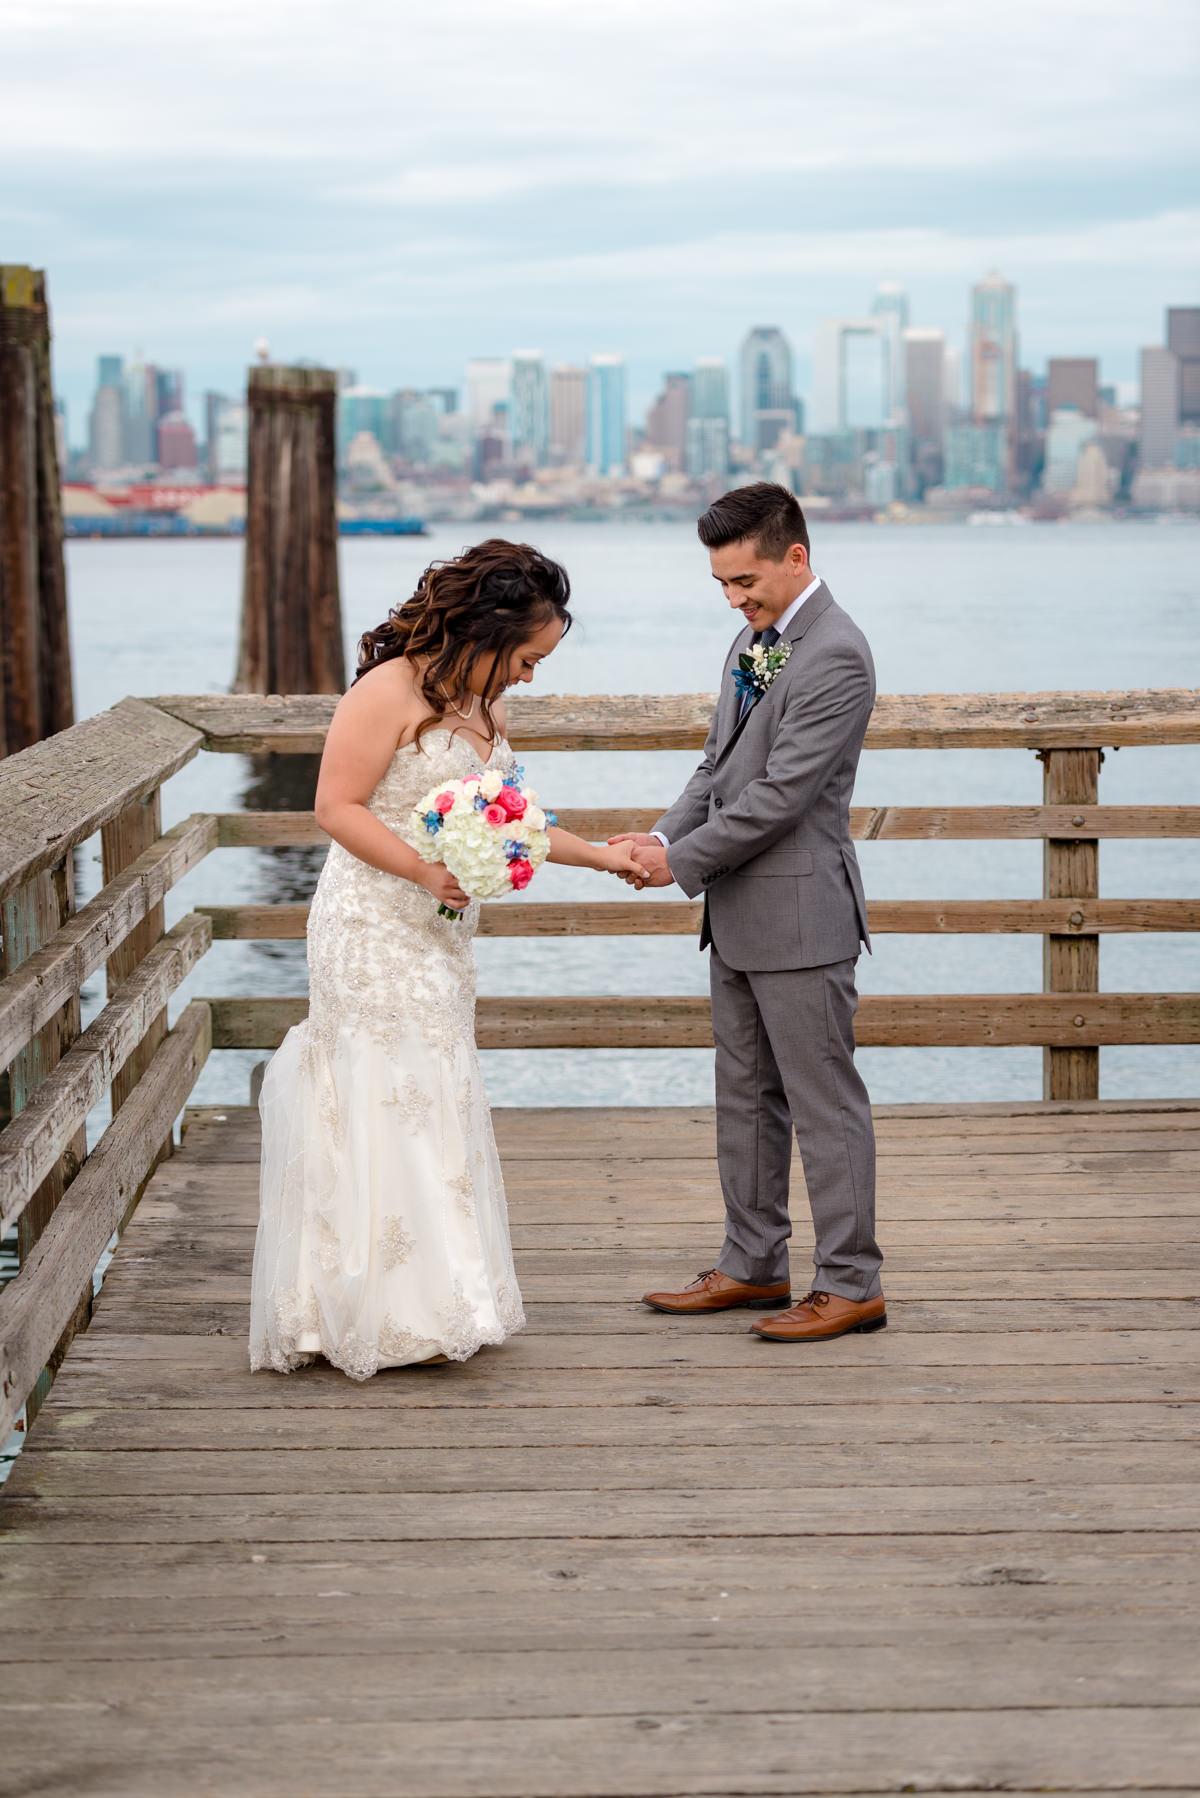 Andrew Tat - Documentary Wedding Photography - Salty's - Seattle, Washington -Mark & Marcy - 03.jpg